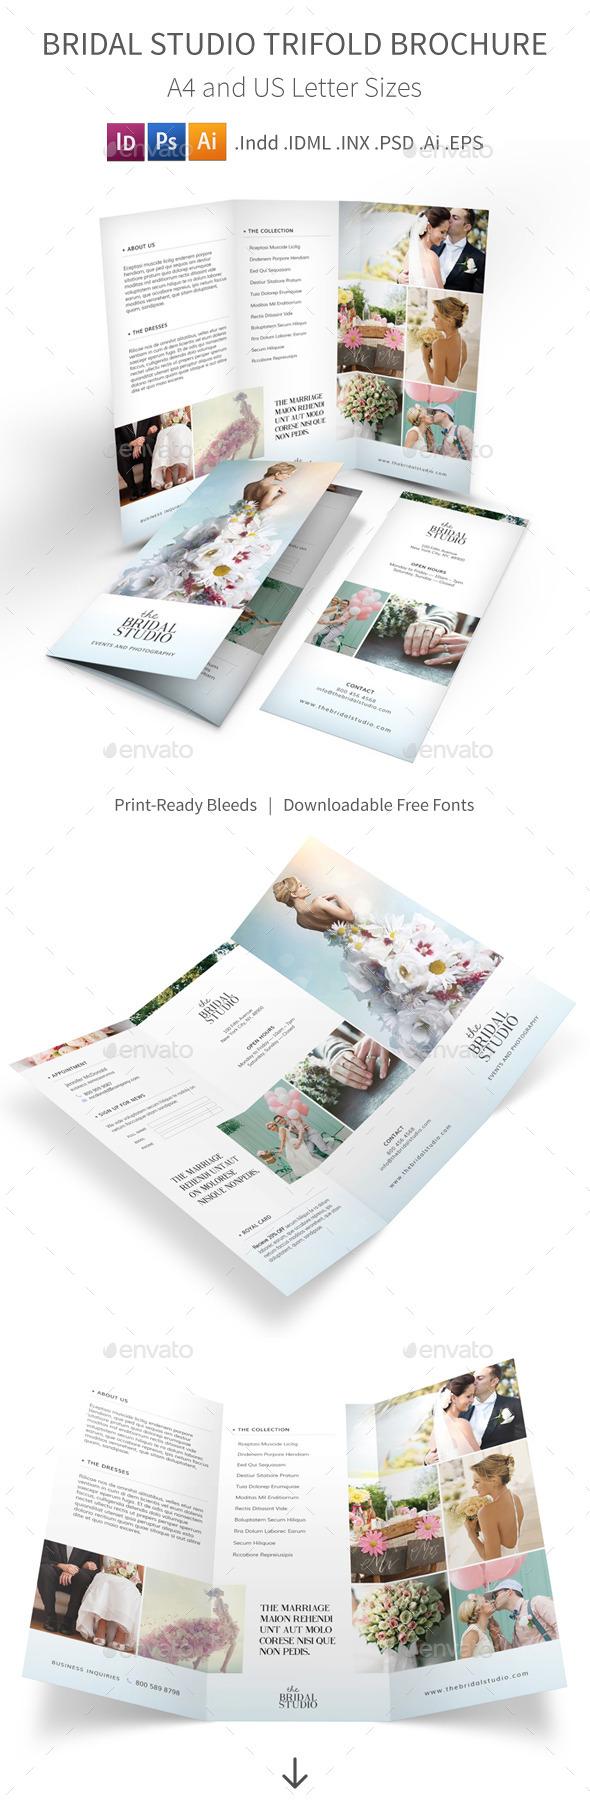 Bridal Studio Trifold Brochure - Informational Brochures